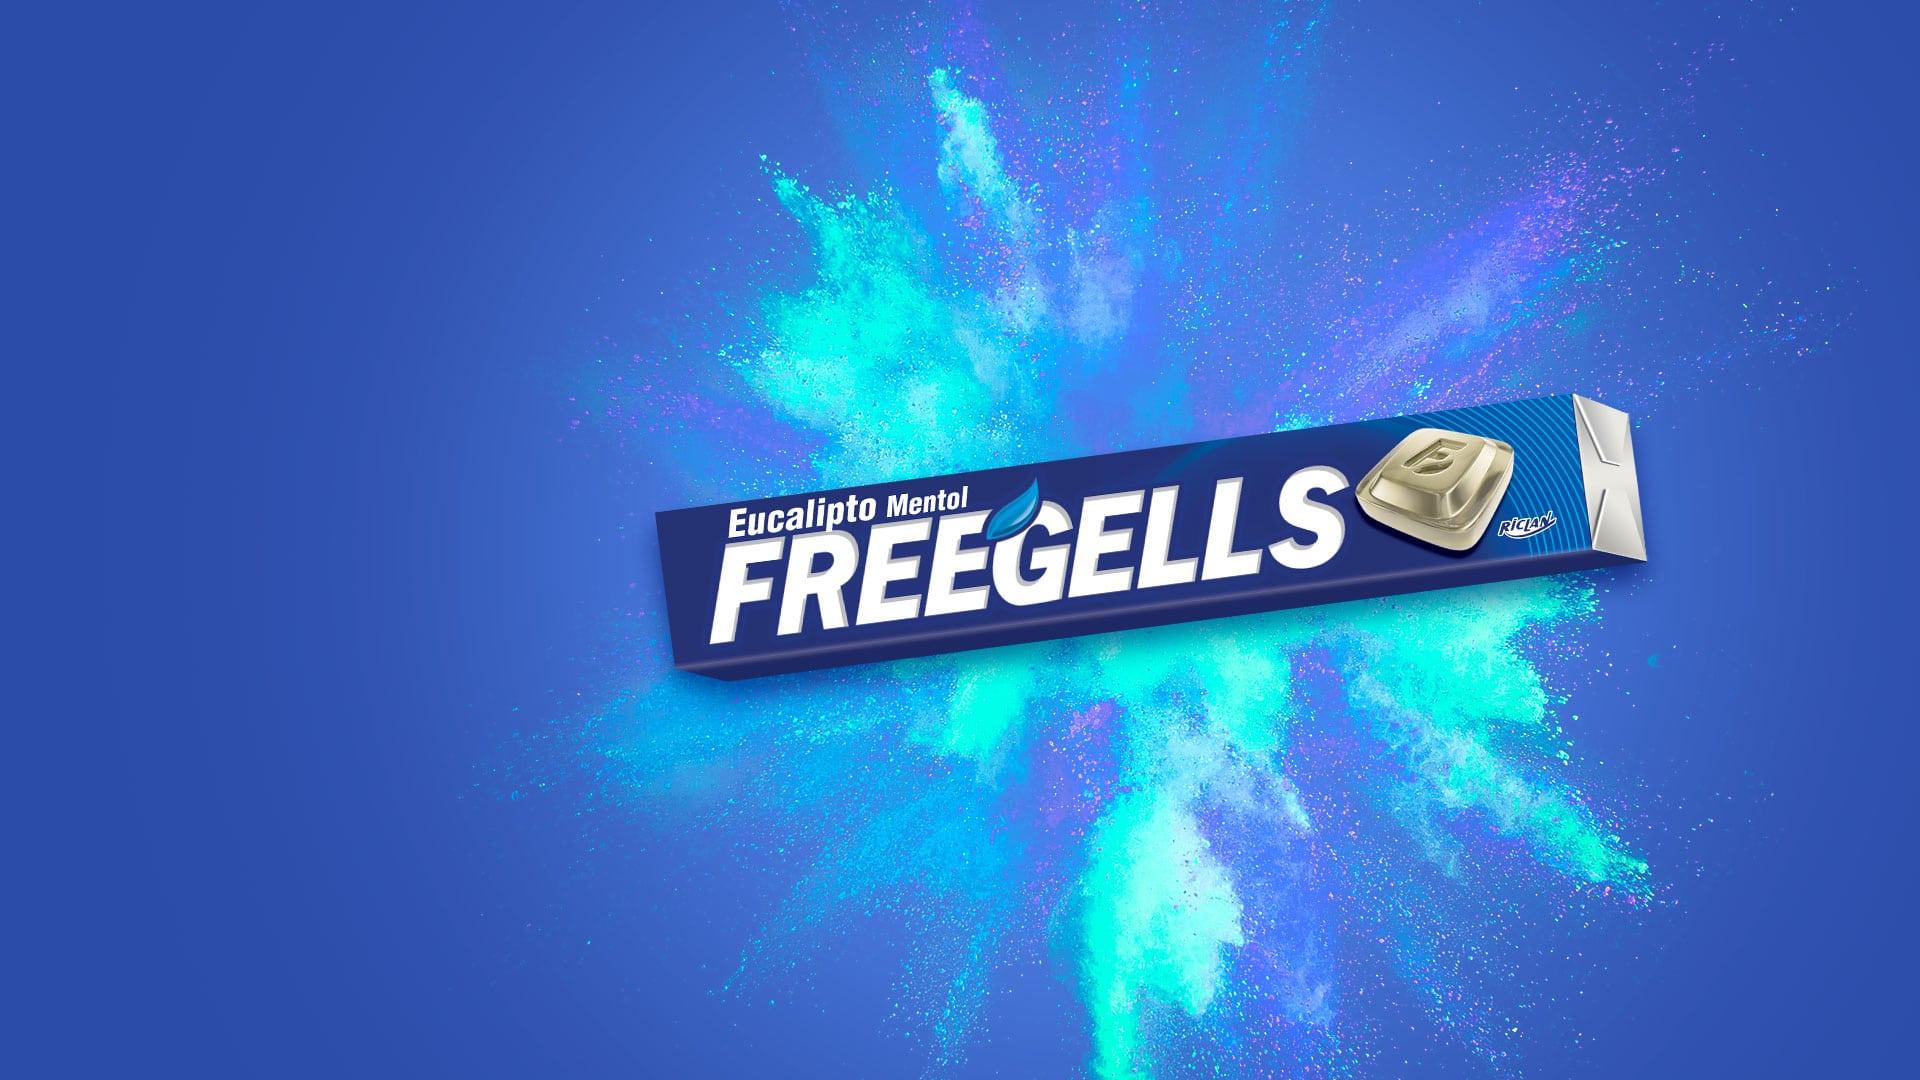 capa freegells - Cases